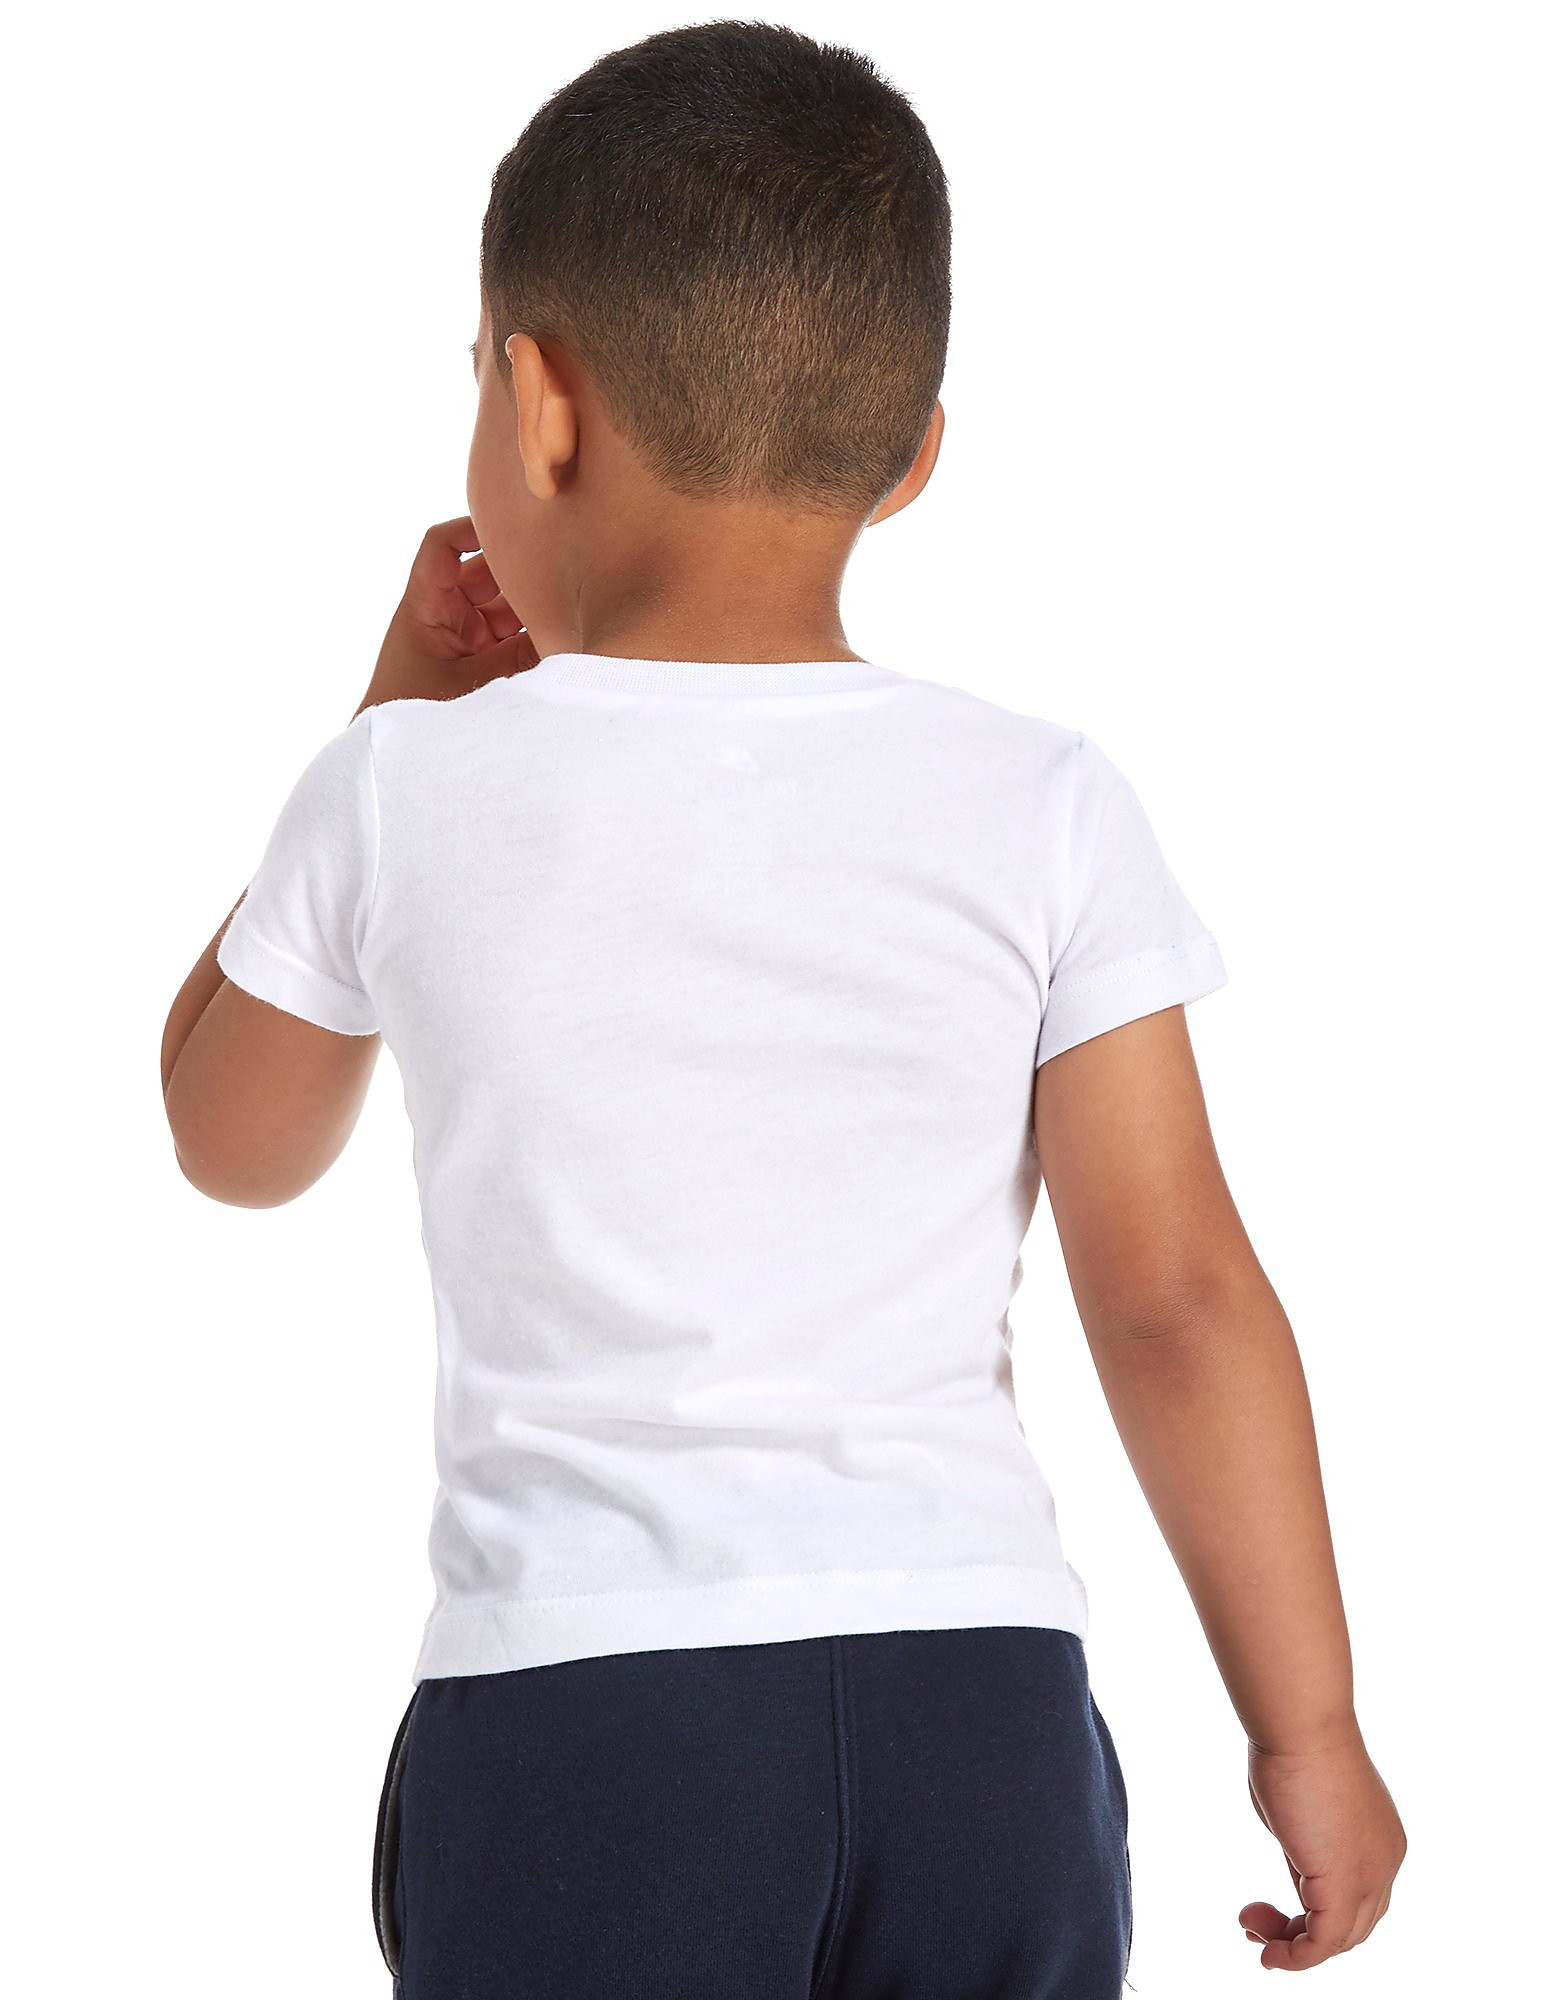 Nike Air Max T-Shirt Infant